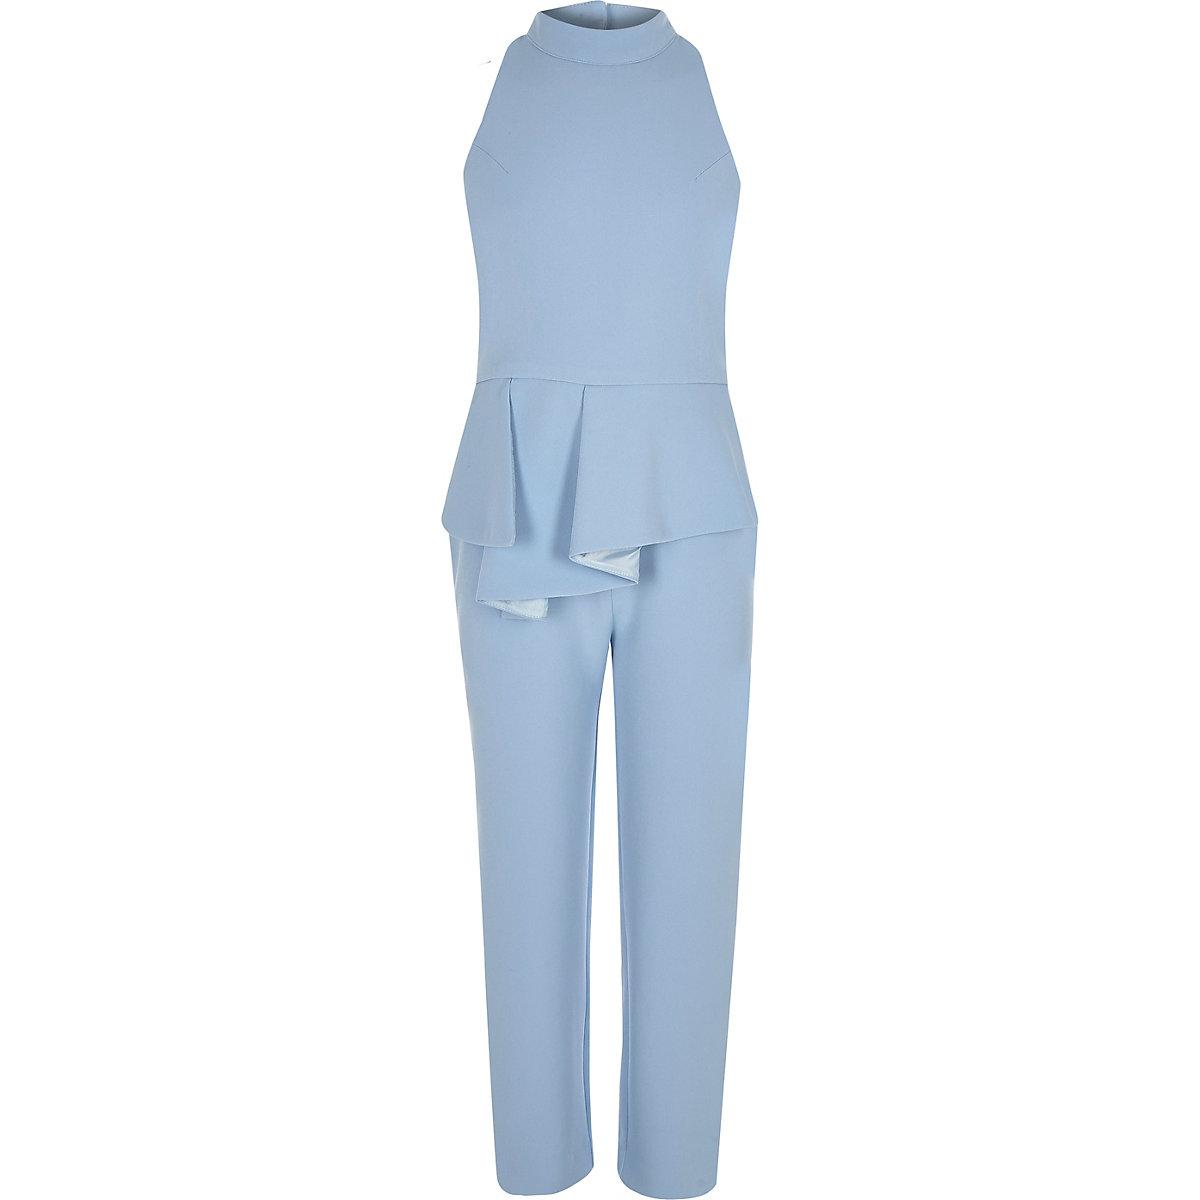 Girls blue peplum halter neck jumpsuit